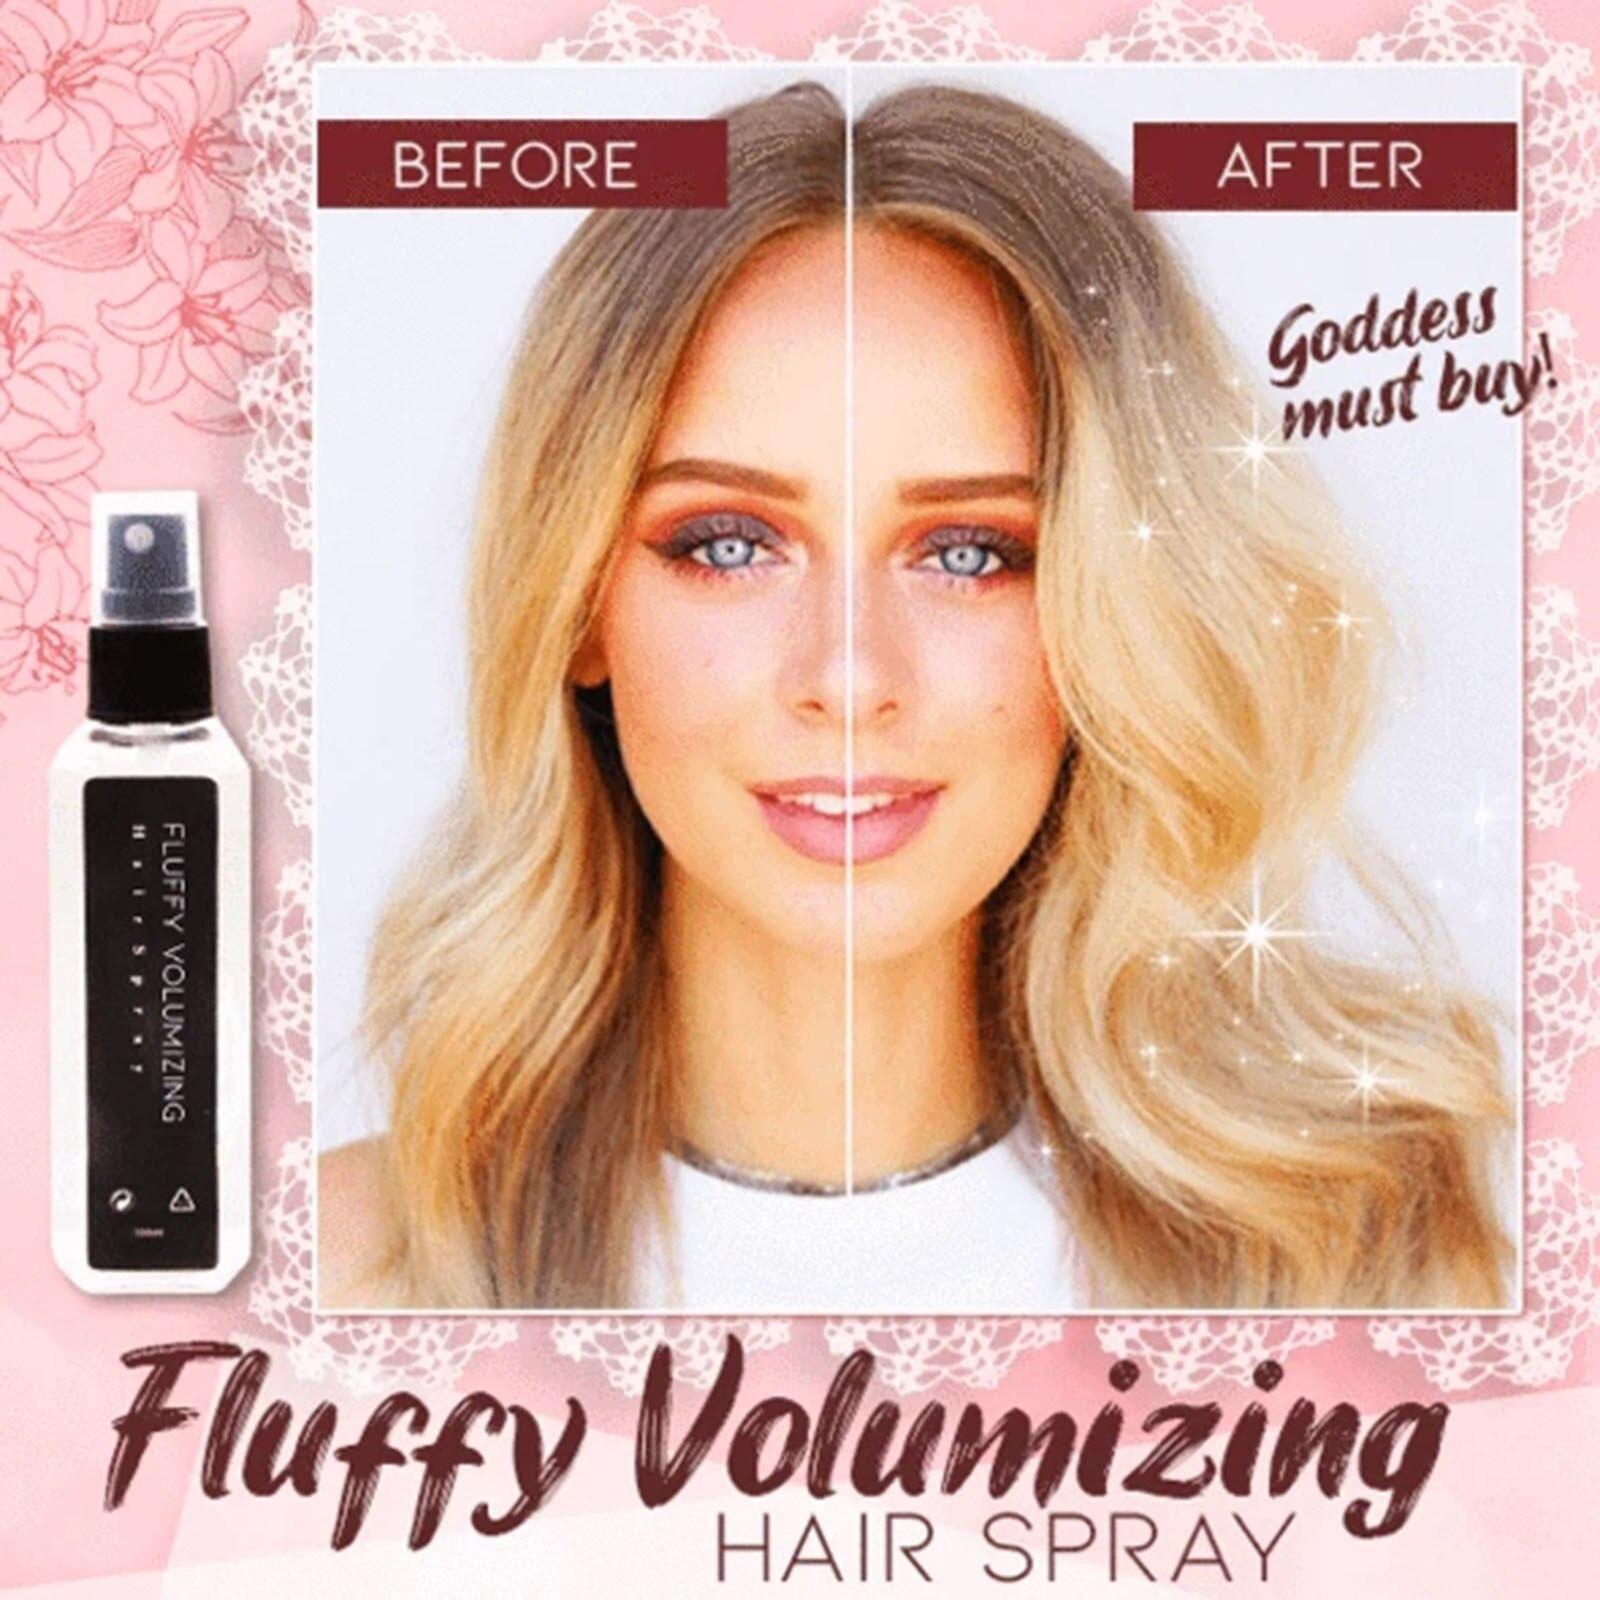 Fluffy Volumizing Hair Spray